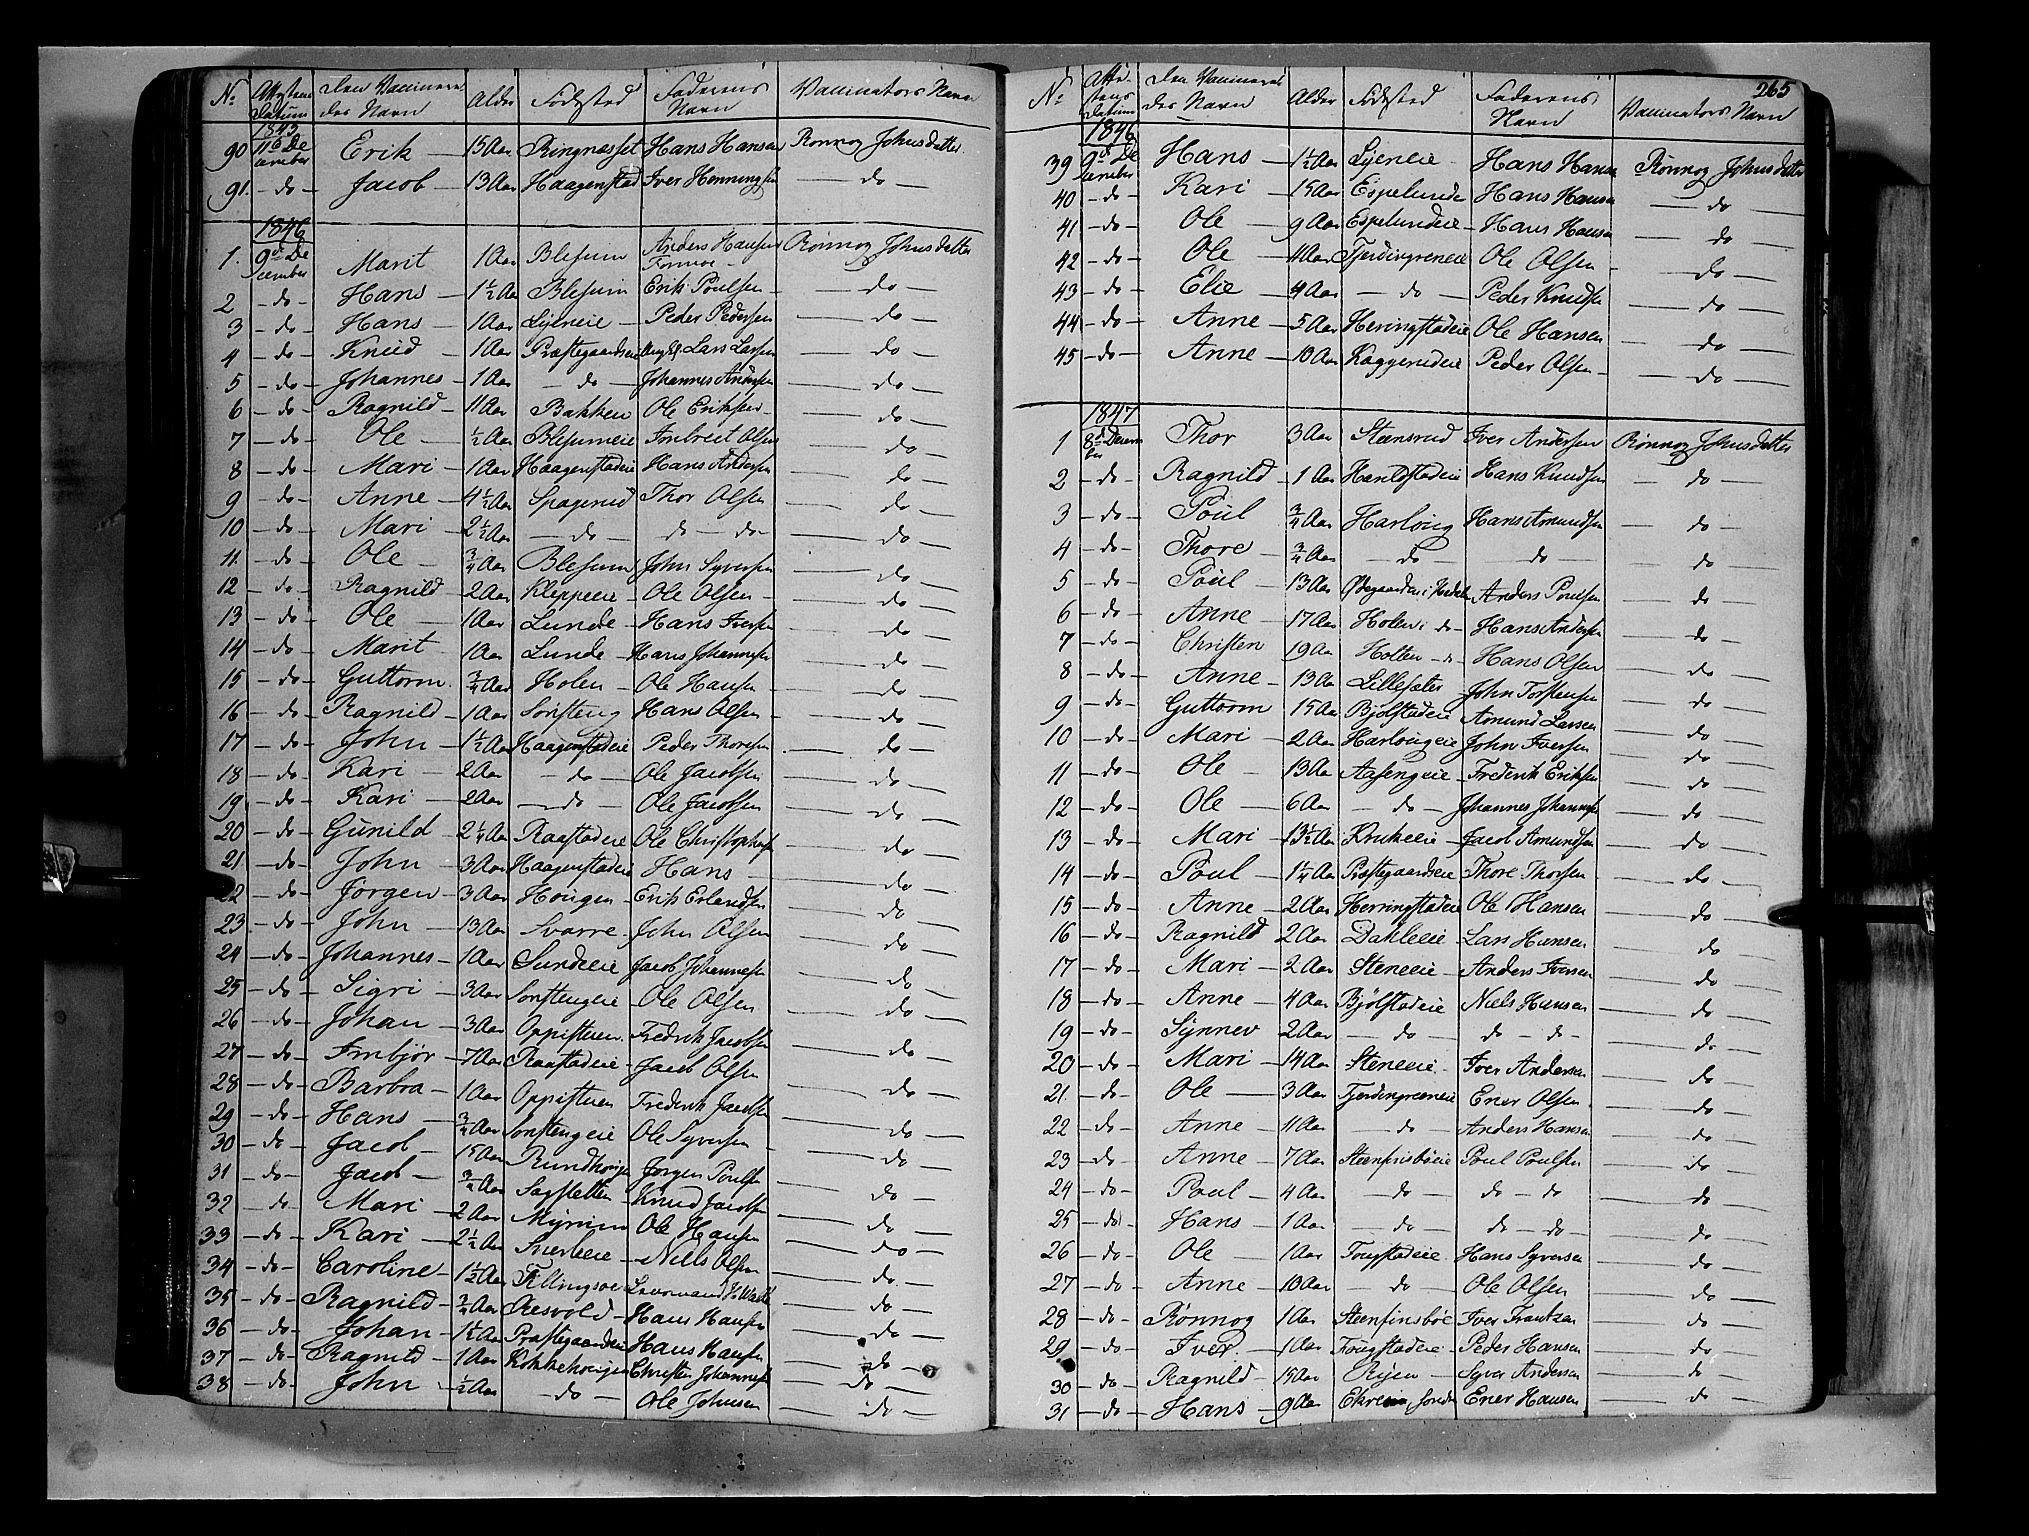 SAH, Vågå prestekontor, Ministerialbok nr. 5 /1, 1842-1856, s. 265